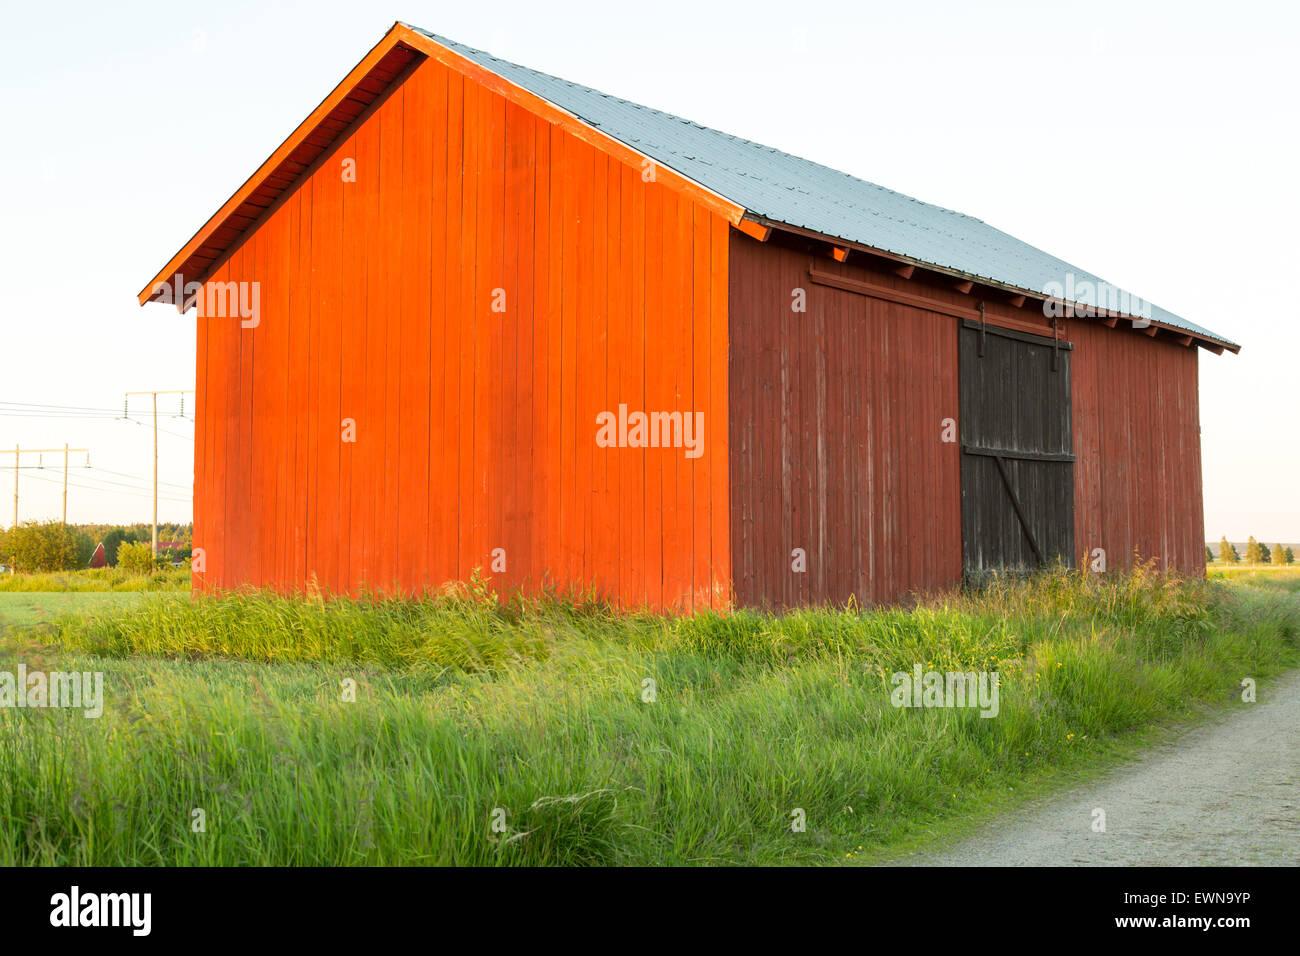 Swedish red Barn - Stock Image